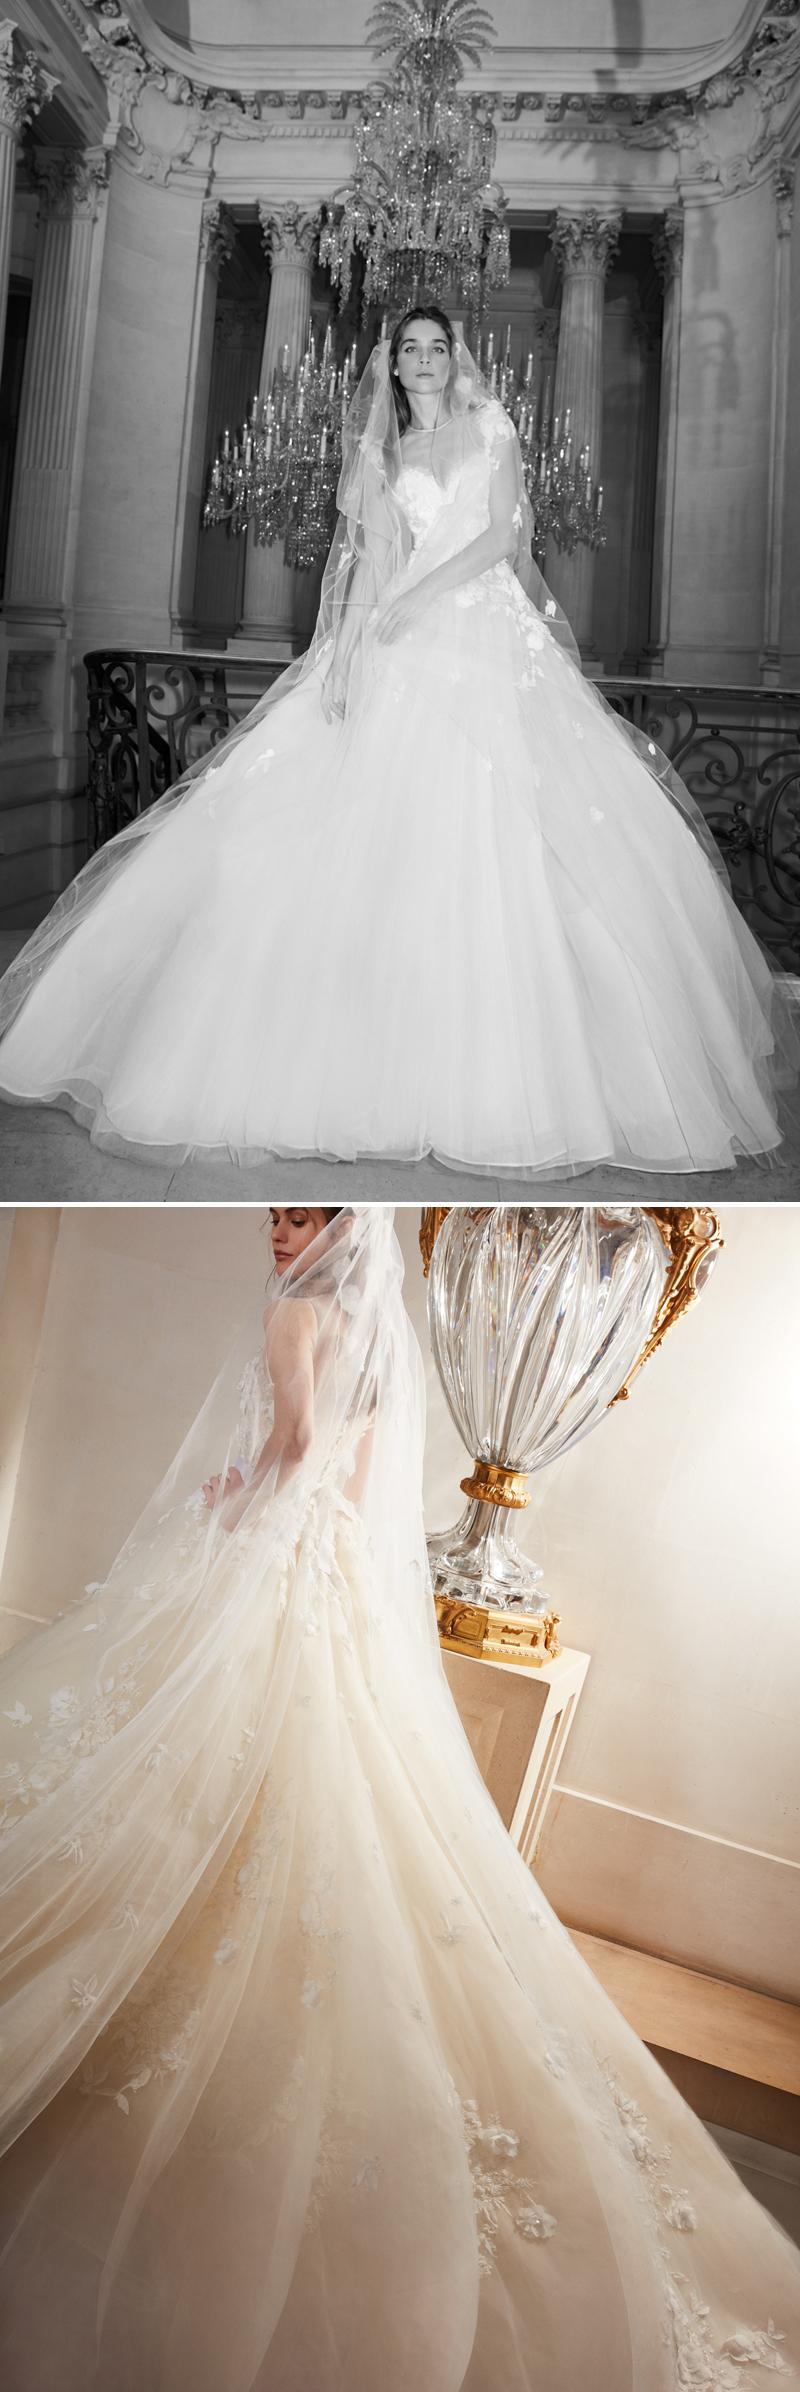 Bal de Vienne, Elie Saab, Elie Saab Bridal, Elie Saab Spring 2019 Bridal Collection, Elie Saab Bal de Vienne, Elie Saab Bride, Elie Saab Wedding Dresses, Perfect Wedding Magazine, Spring 2019 Bridal Trends